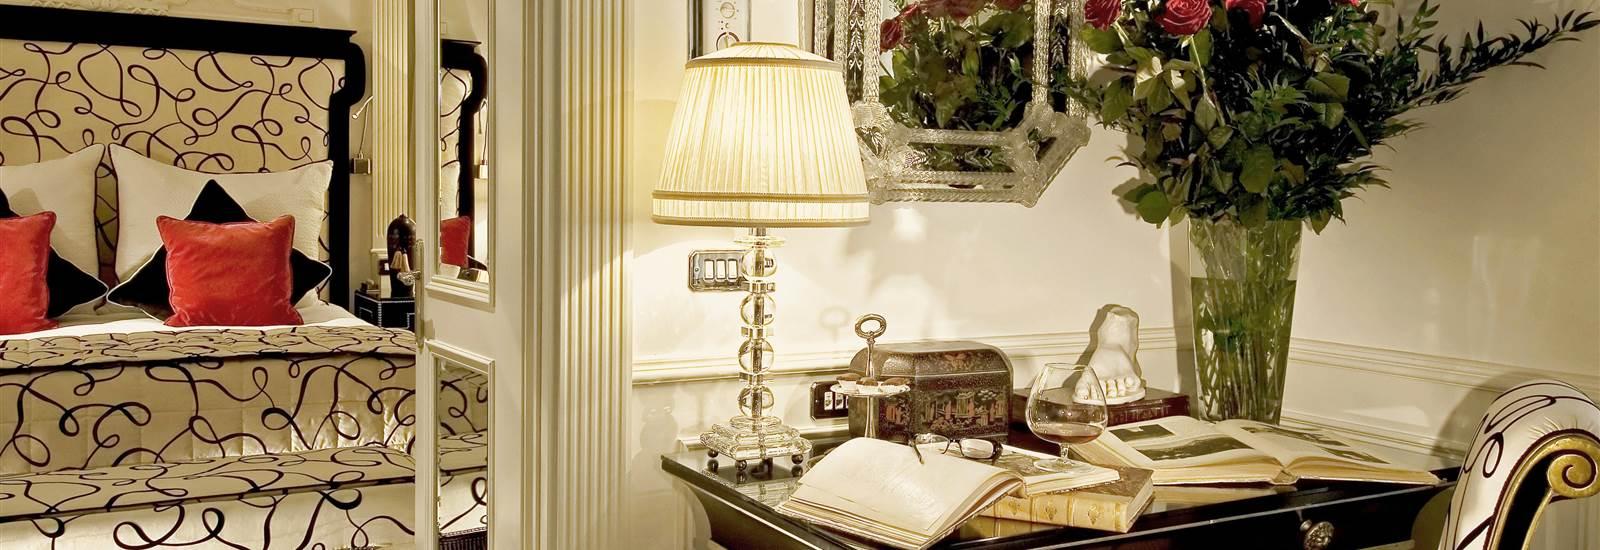 Presidential Suite Trinita dei Monti MOD